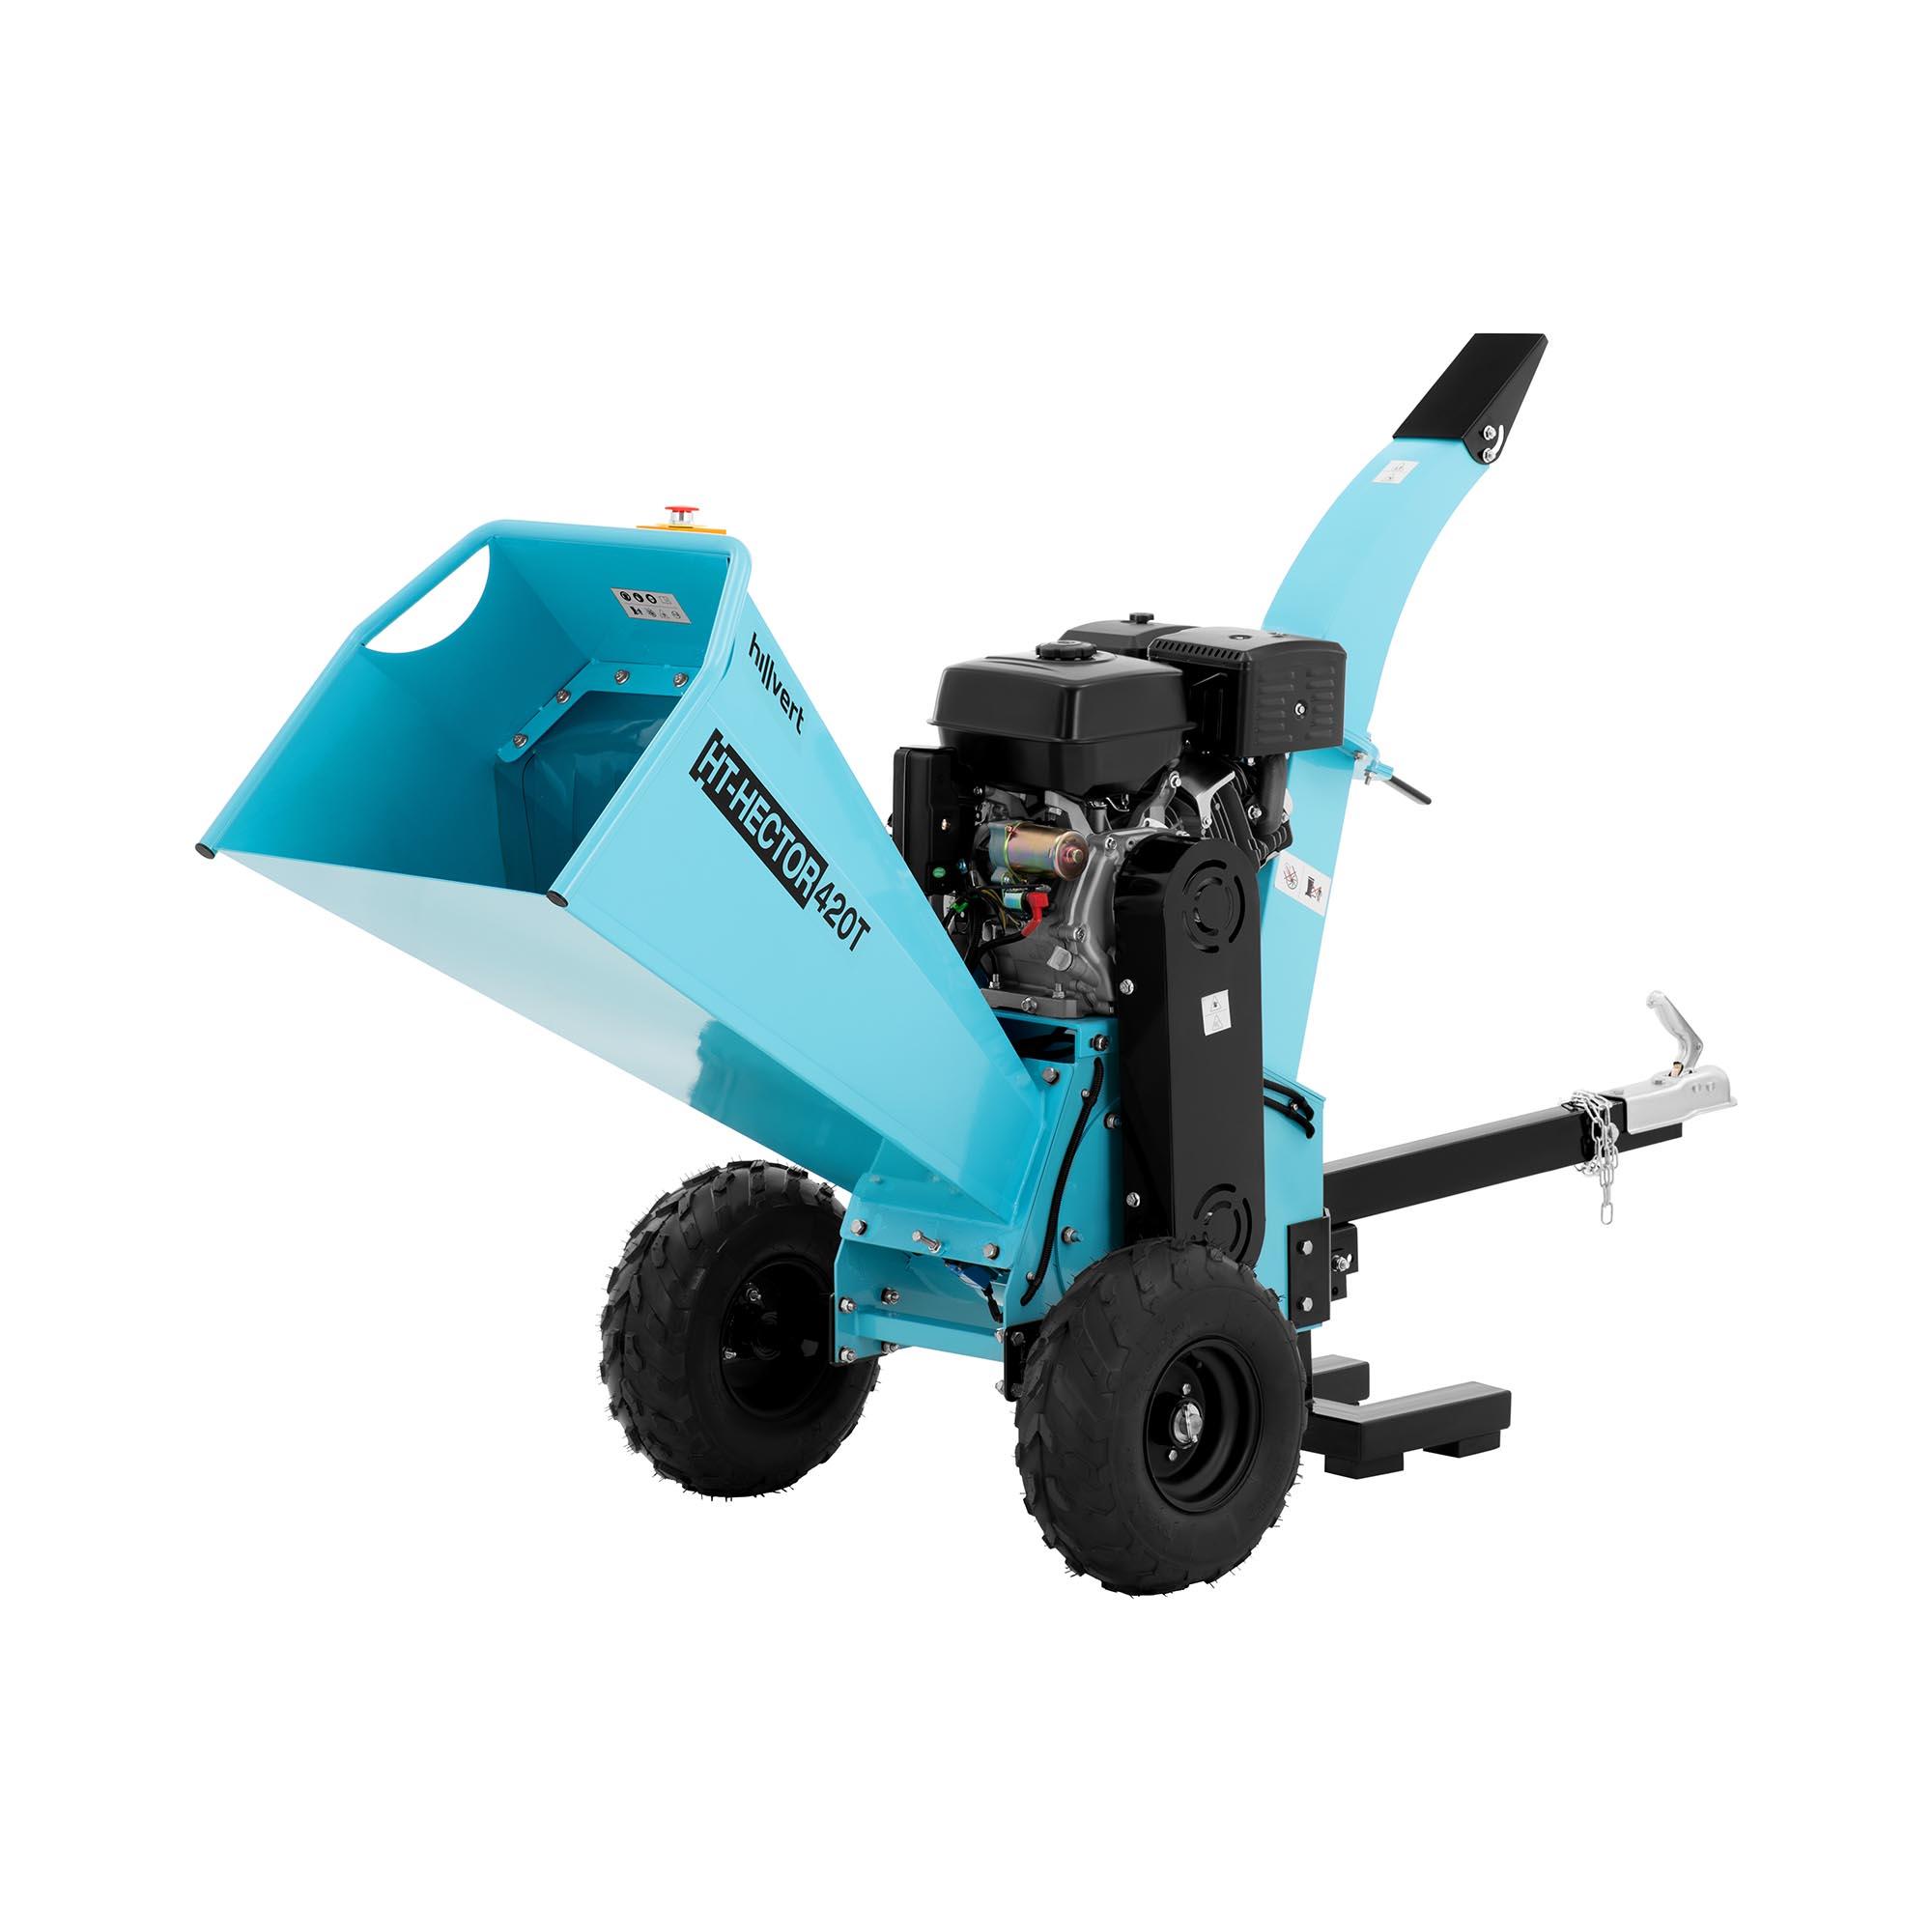 hillvert Benzin Häcksler - 15 PS - 120 mm HT-HECTOR 420T